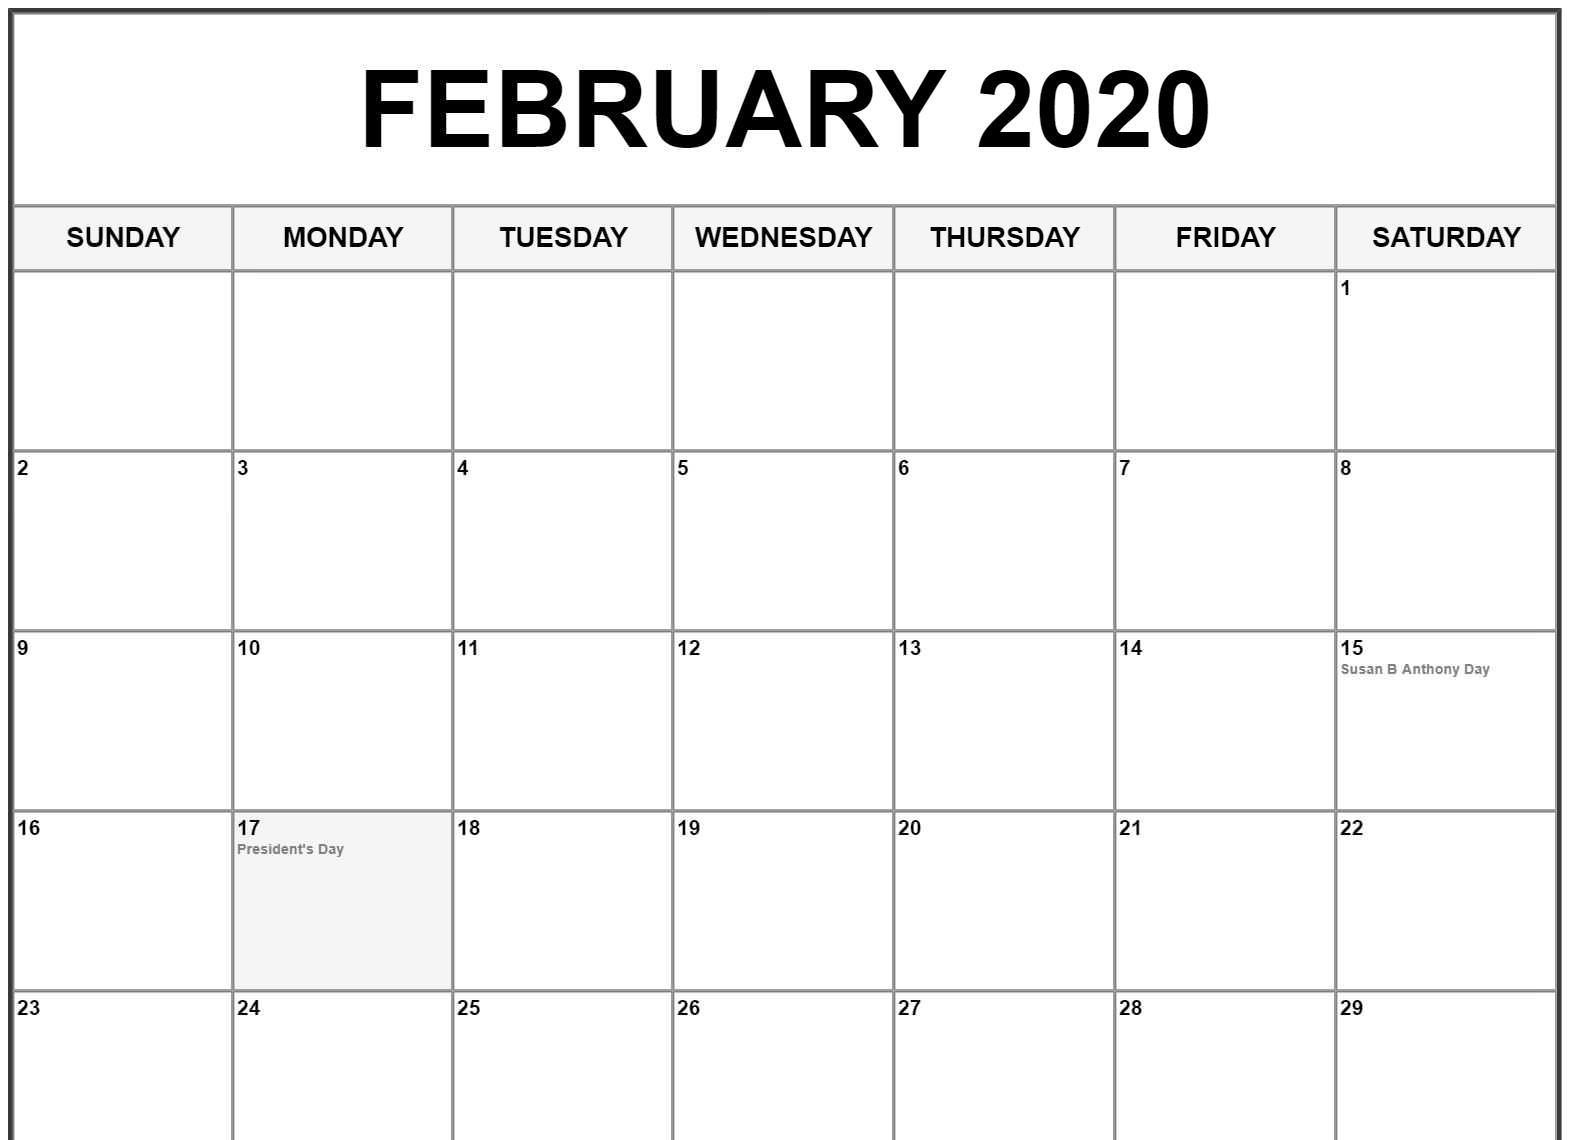 February 2020 Calendar Us Holidays